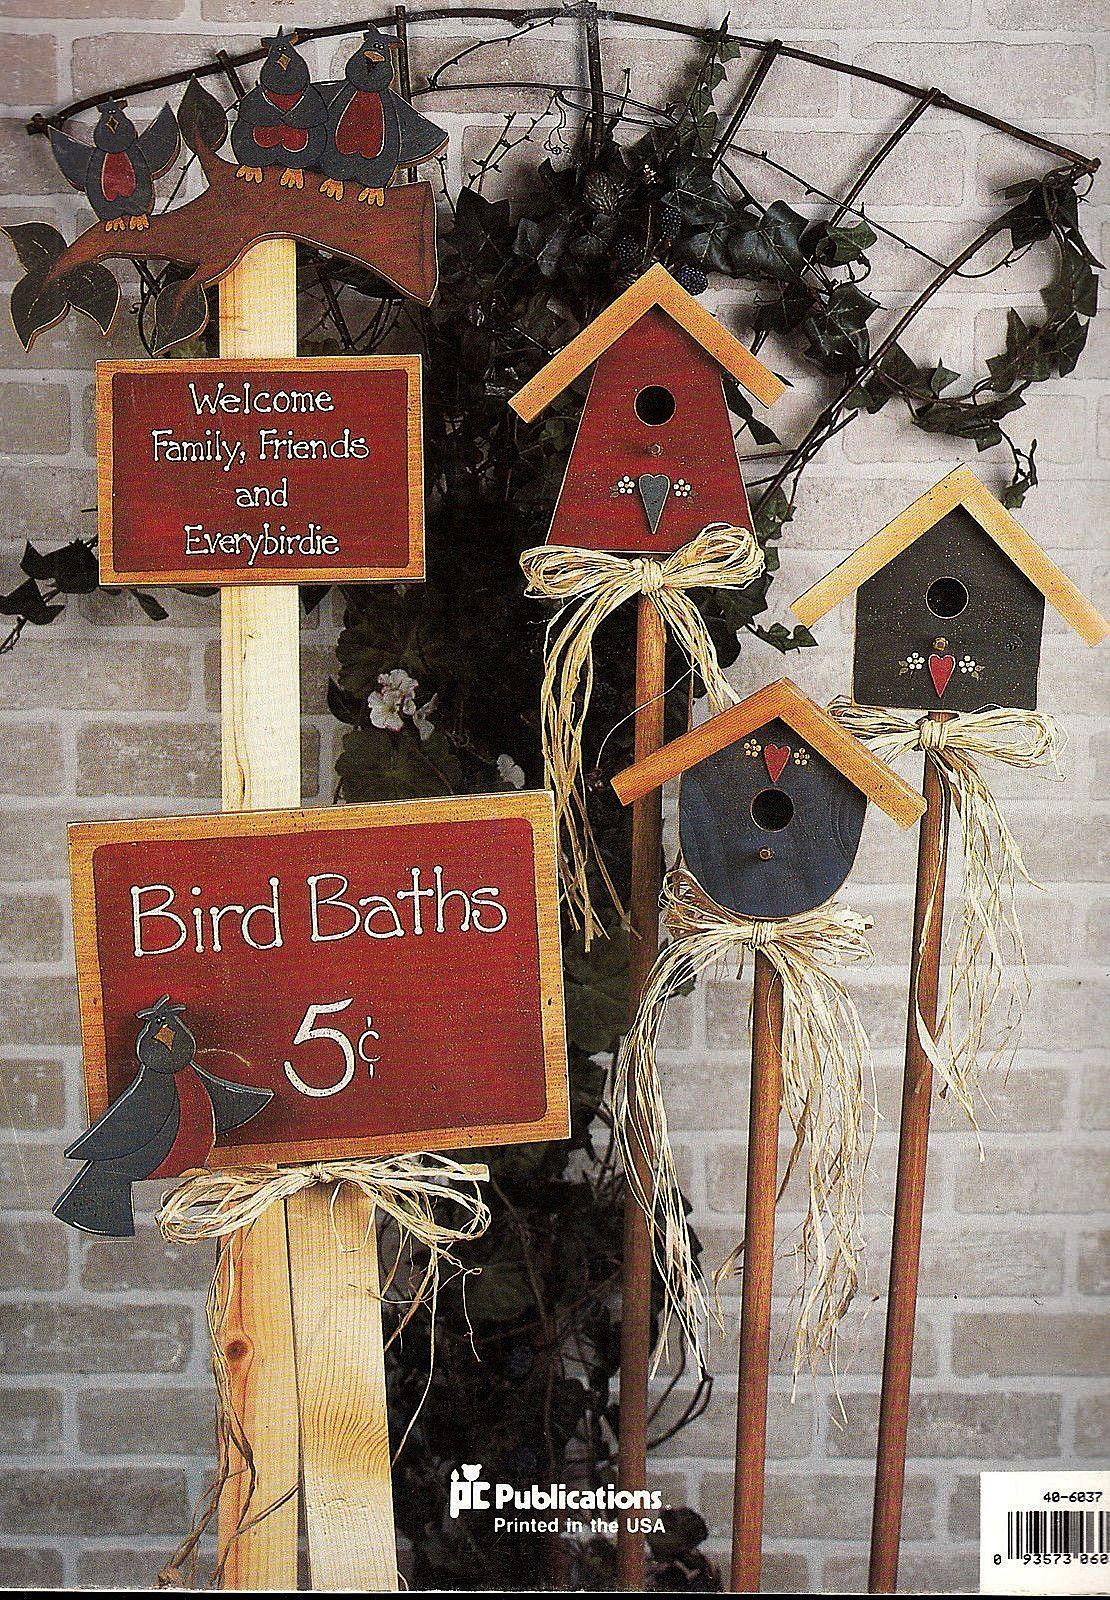 pingl par christine sur projets nichoir cabane oiseaux et projet. Black Bedroom Furniture Sets. Home Design Ideas